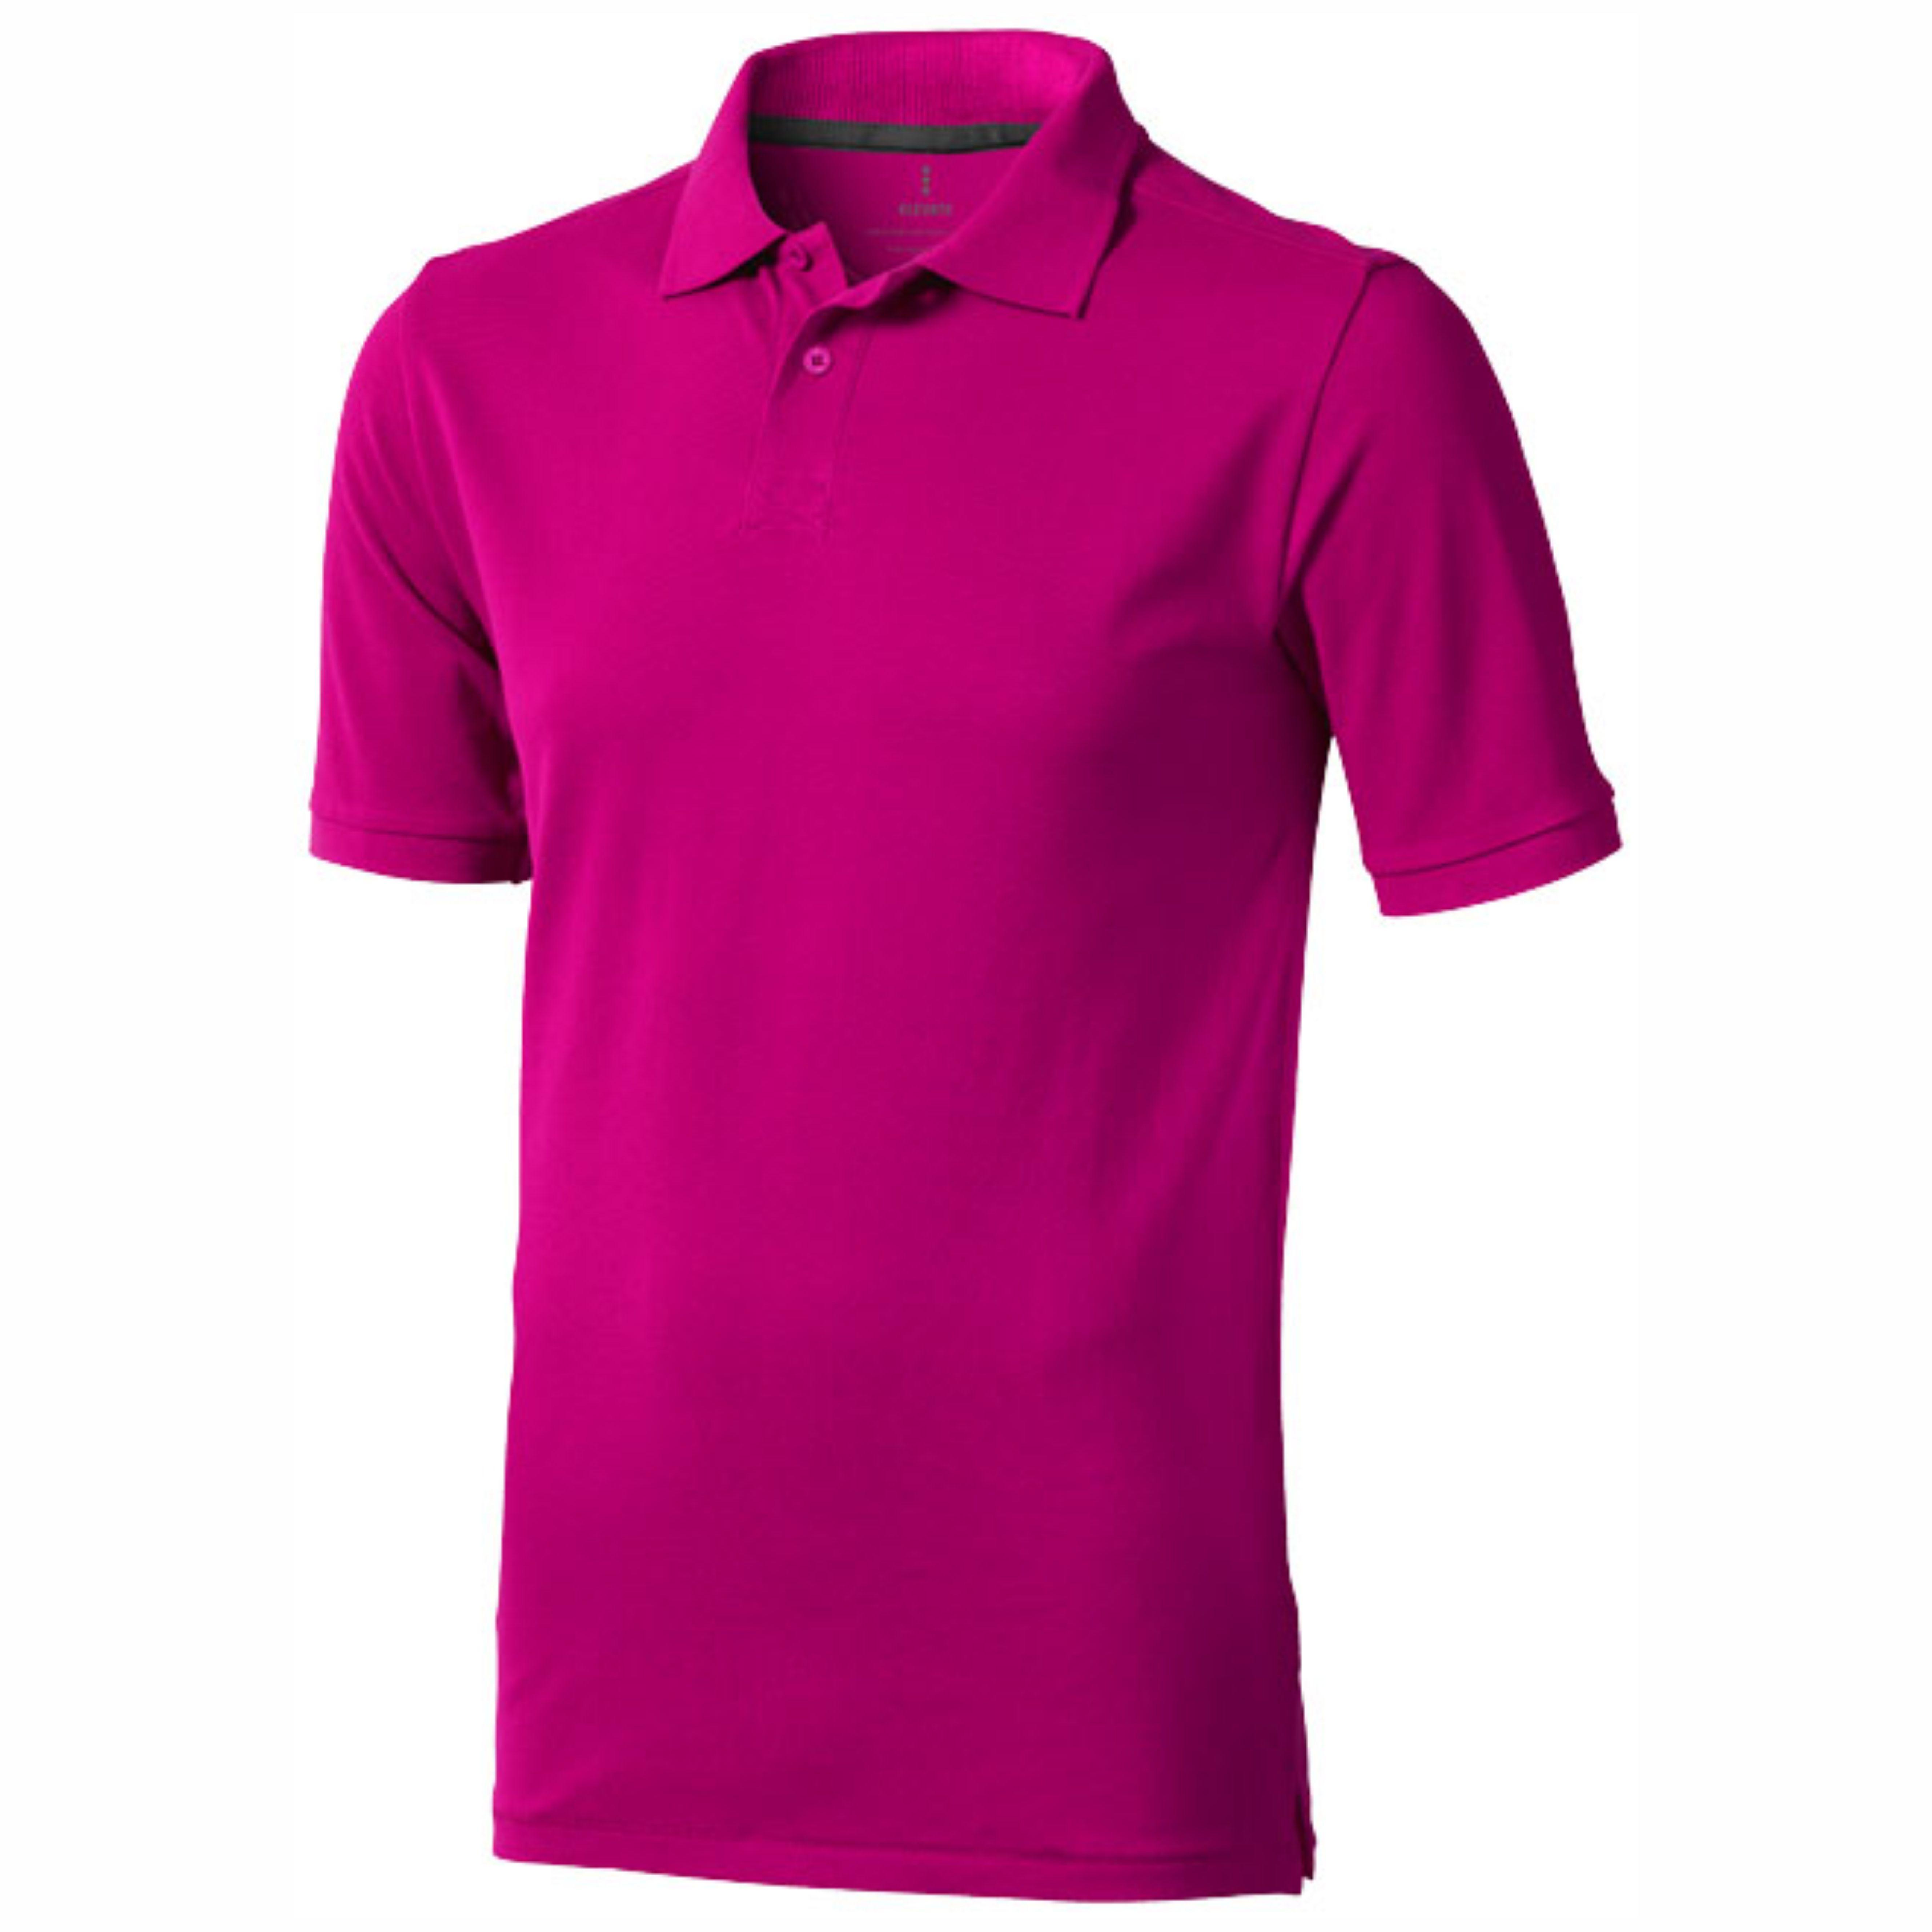 Polo manga corta de hombre color rosa Elevate 2338080